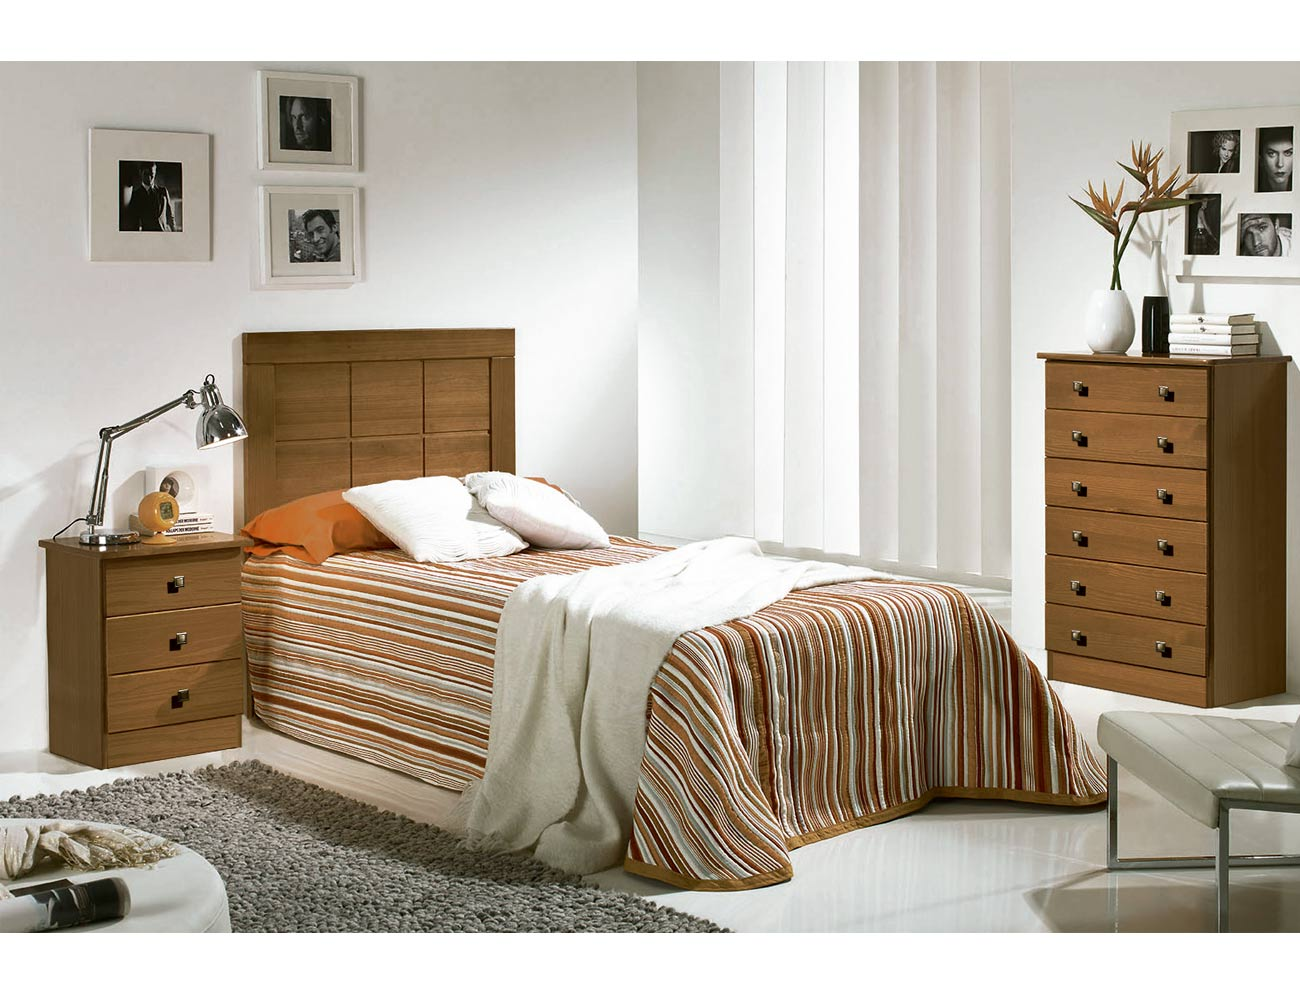 Dormitorio juvenil kenia madera nogal3